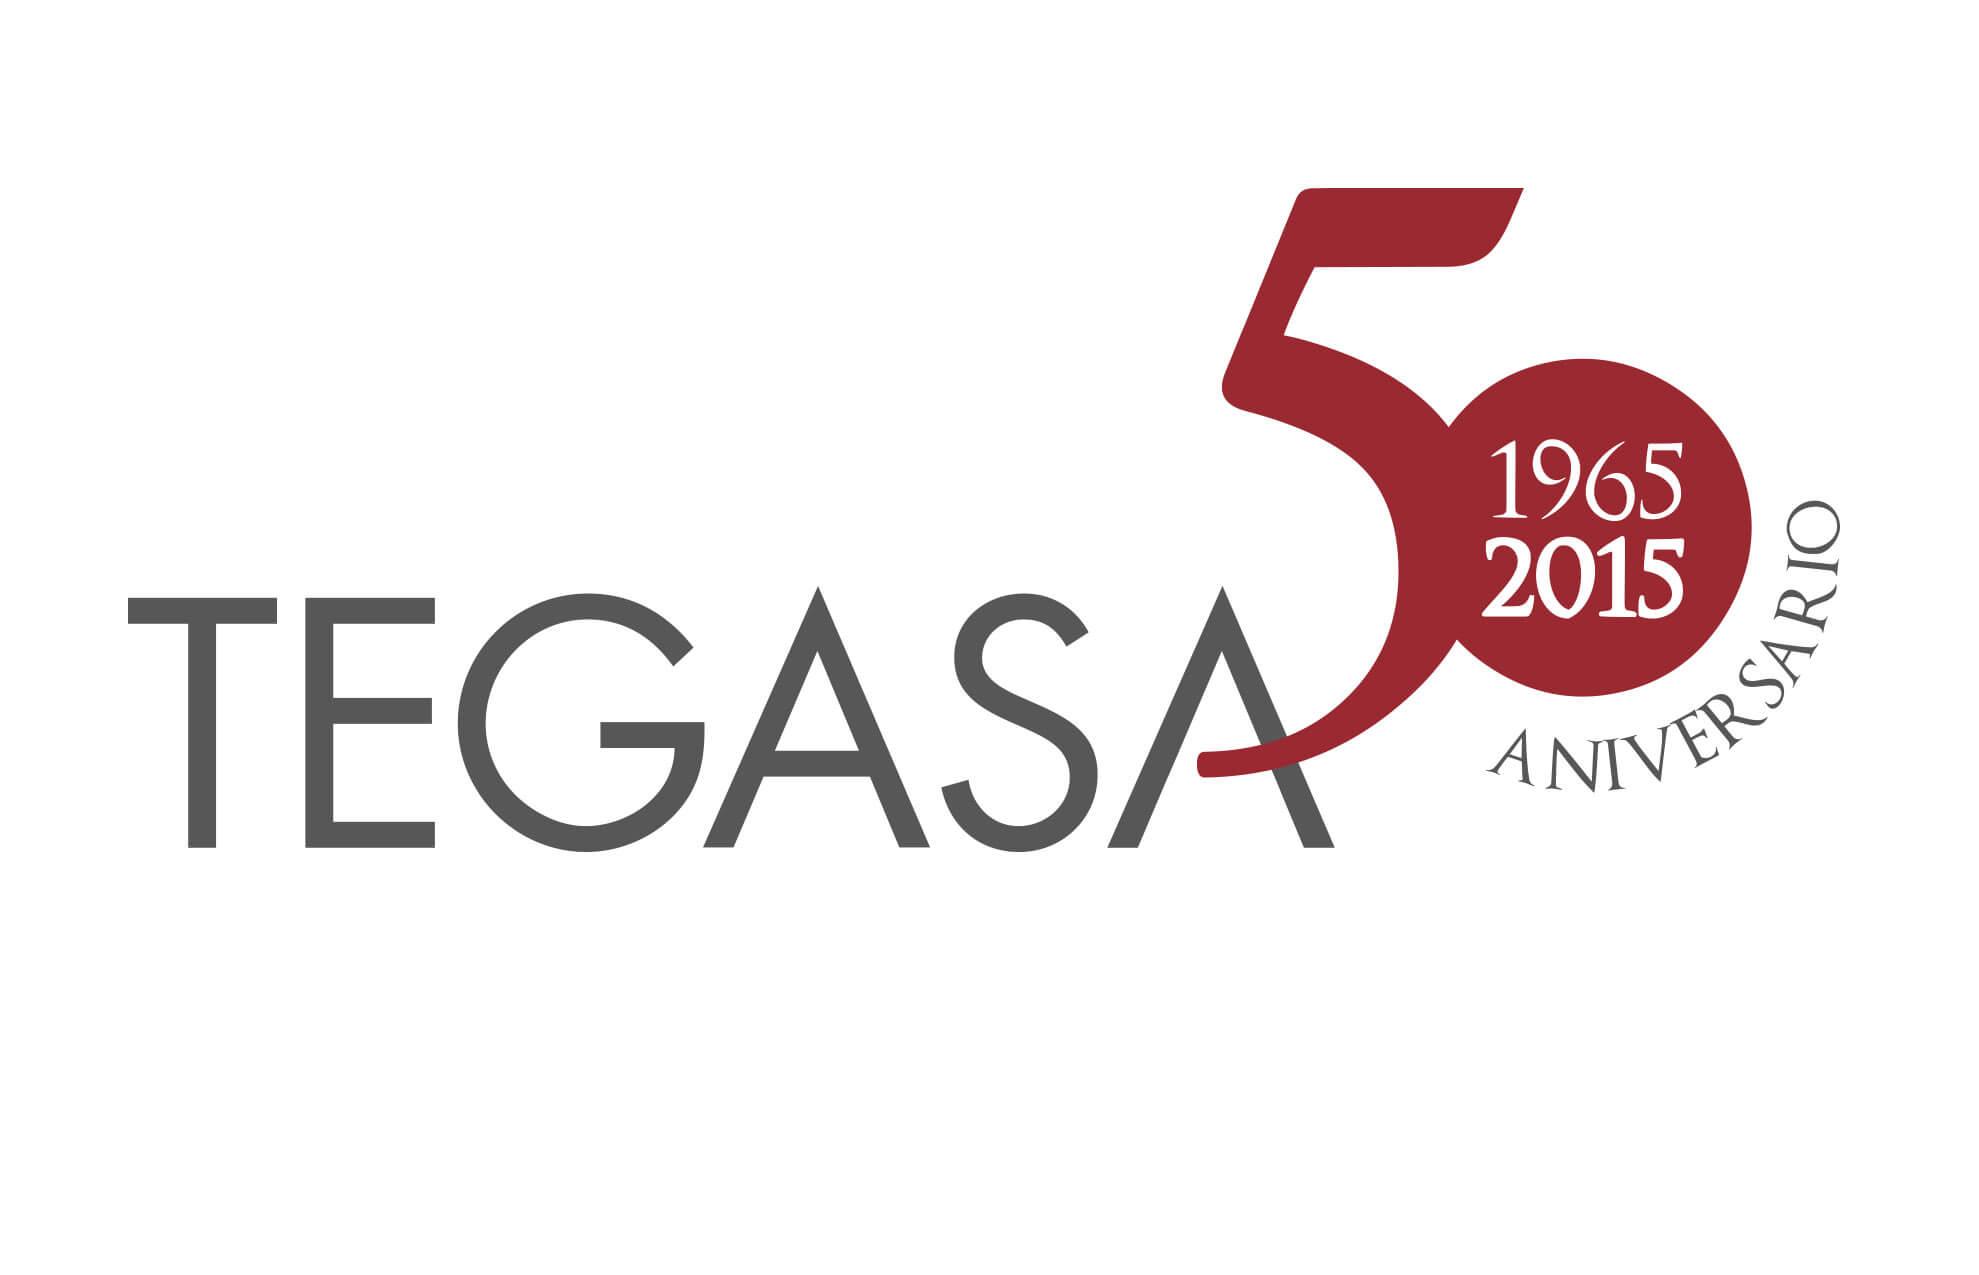 Tegas logotipo conmemorativo 501 - Diseño de branding conmemorativo